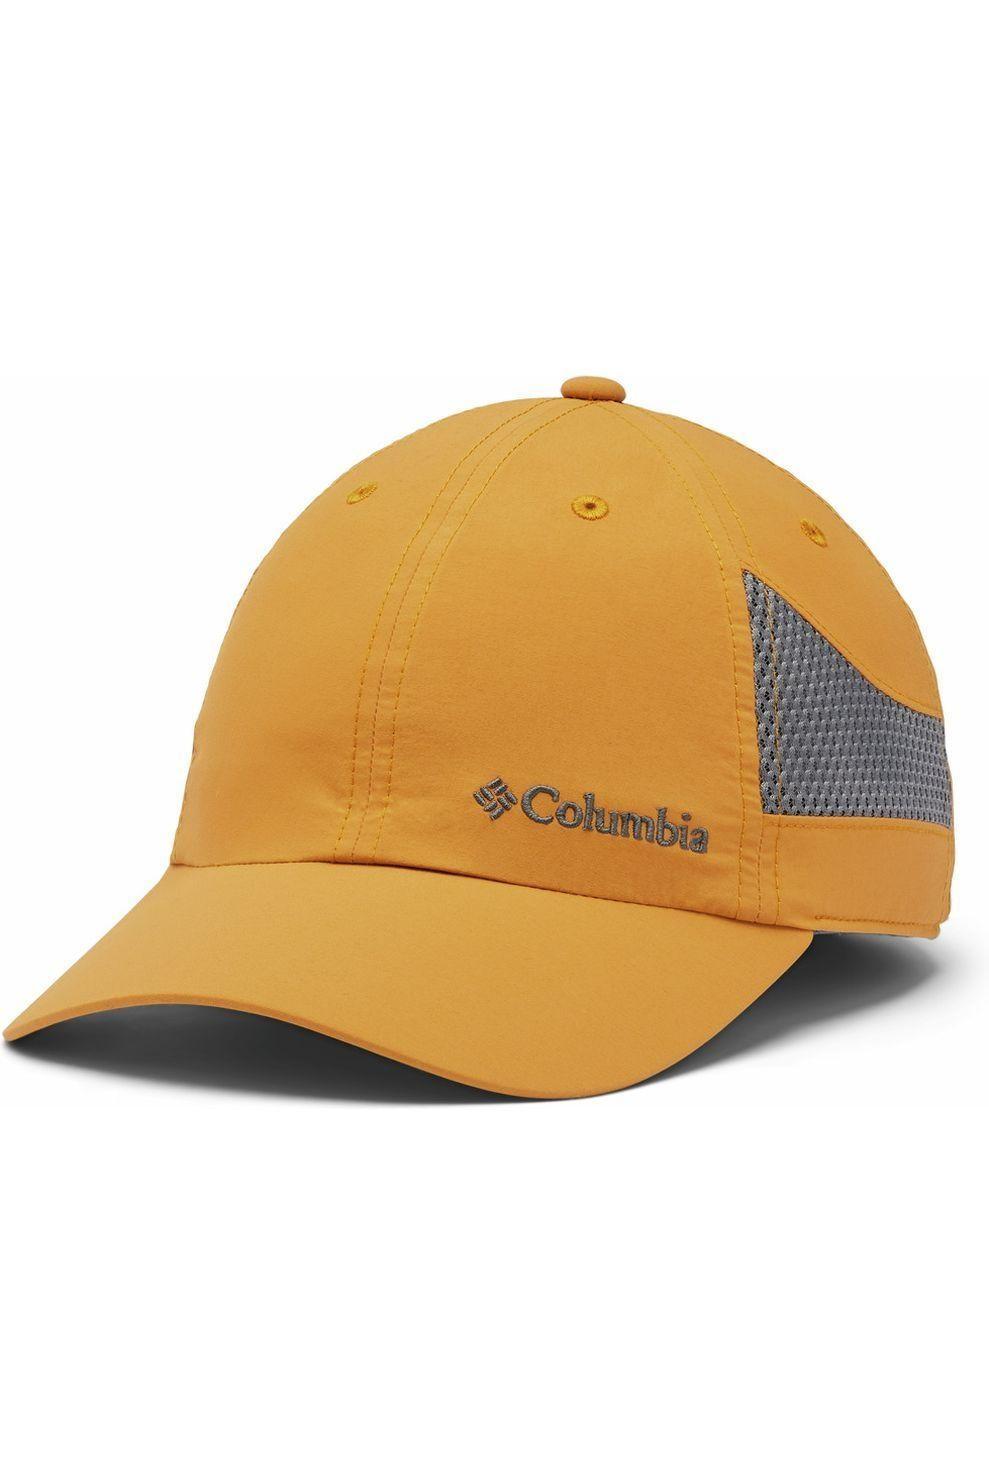 Columbia Pet Tech Shade Hat - Bruin